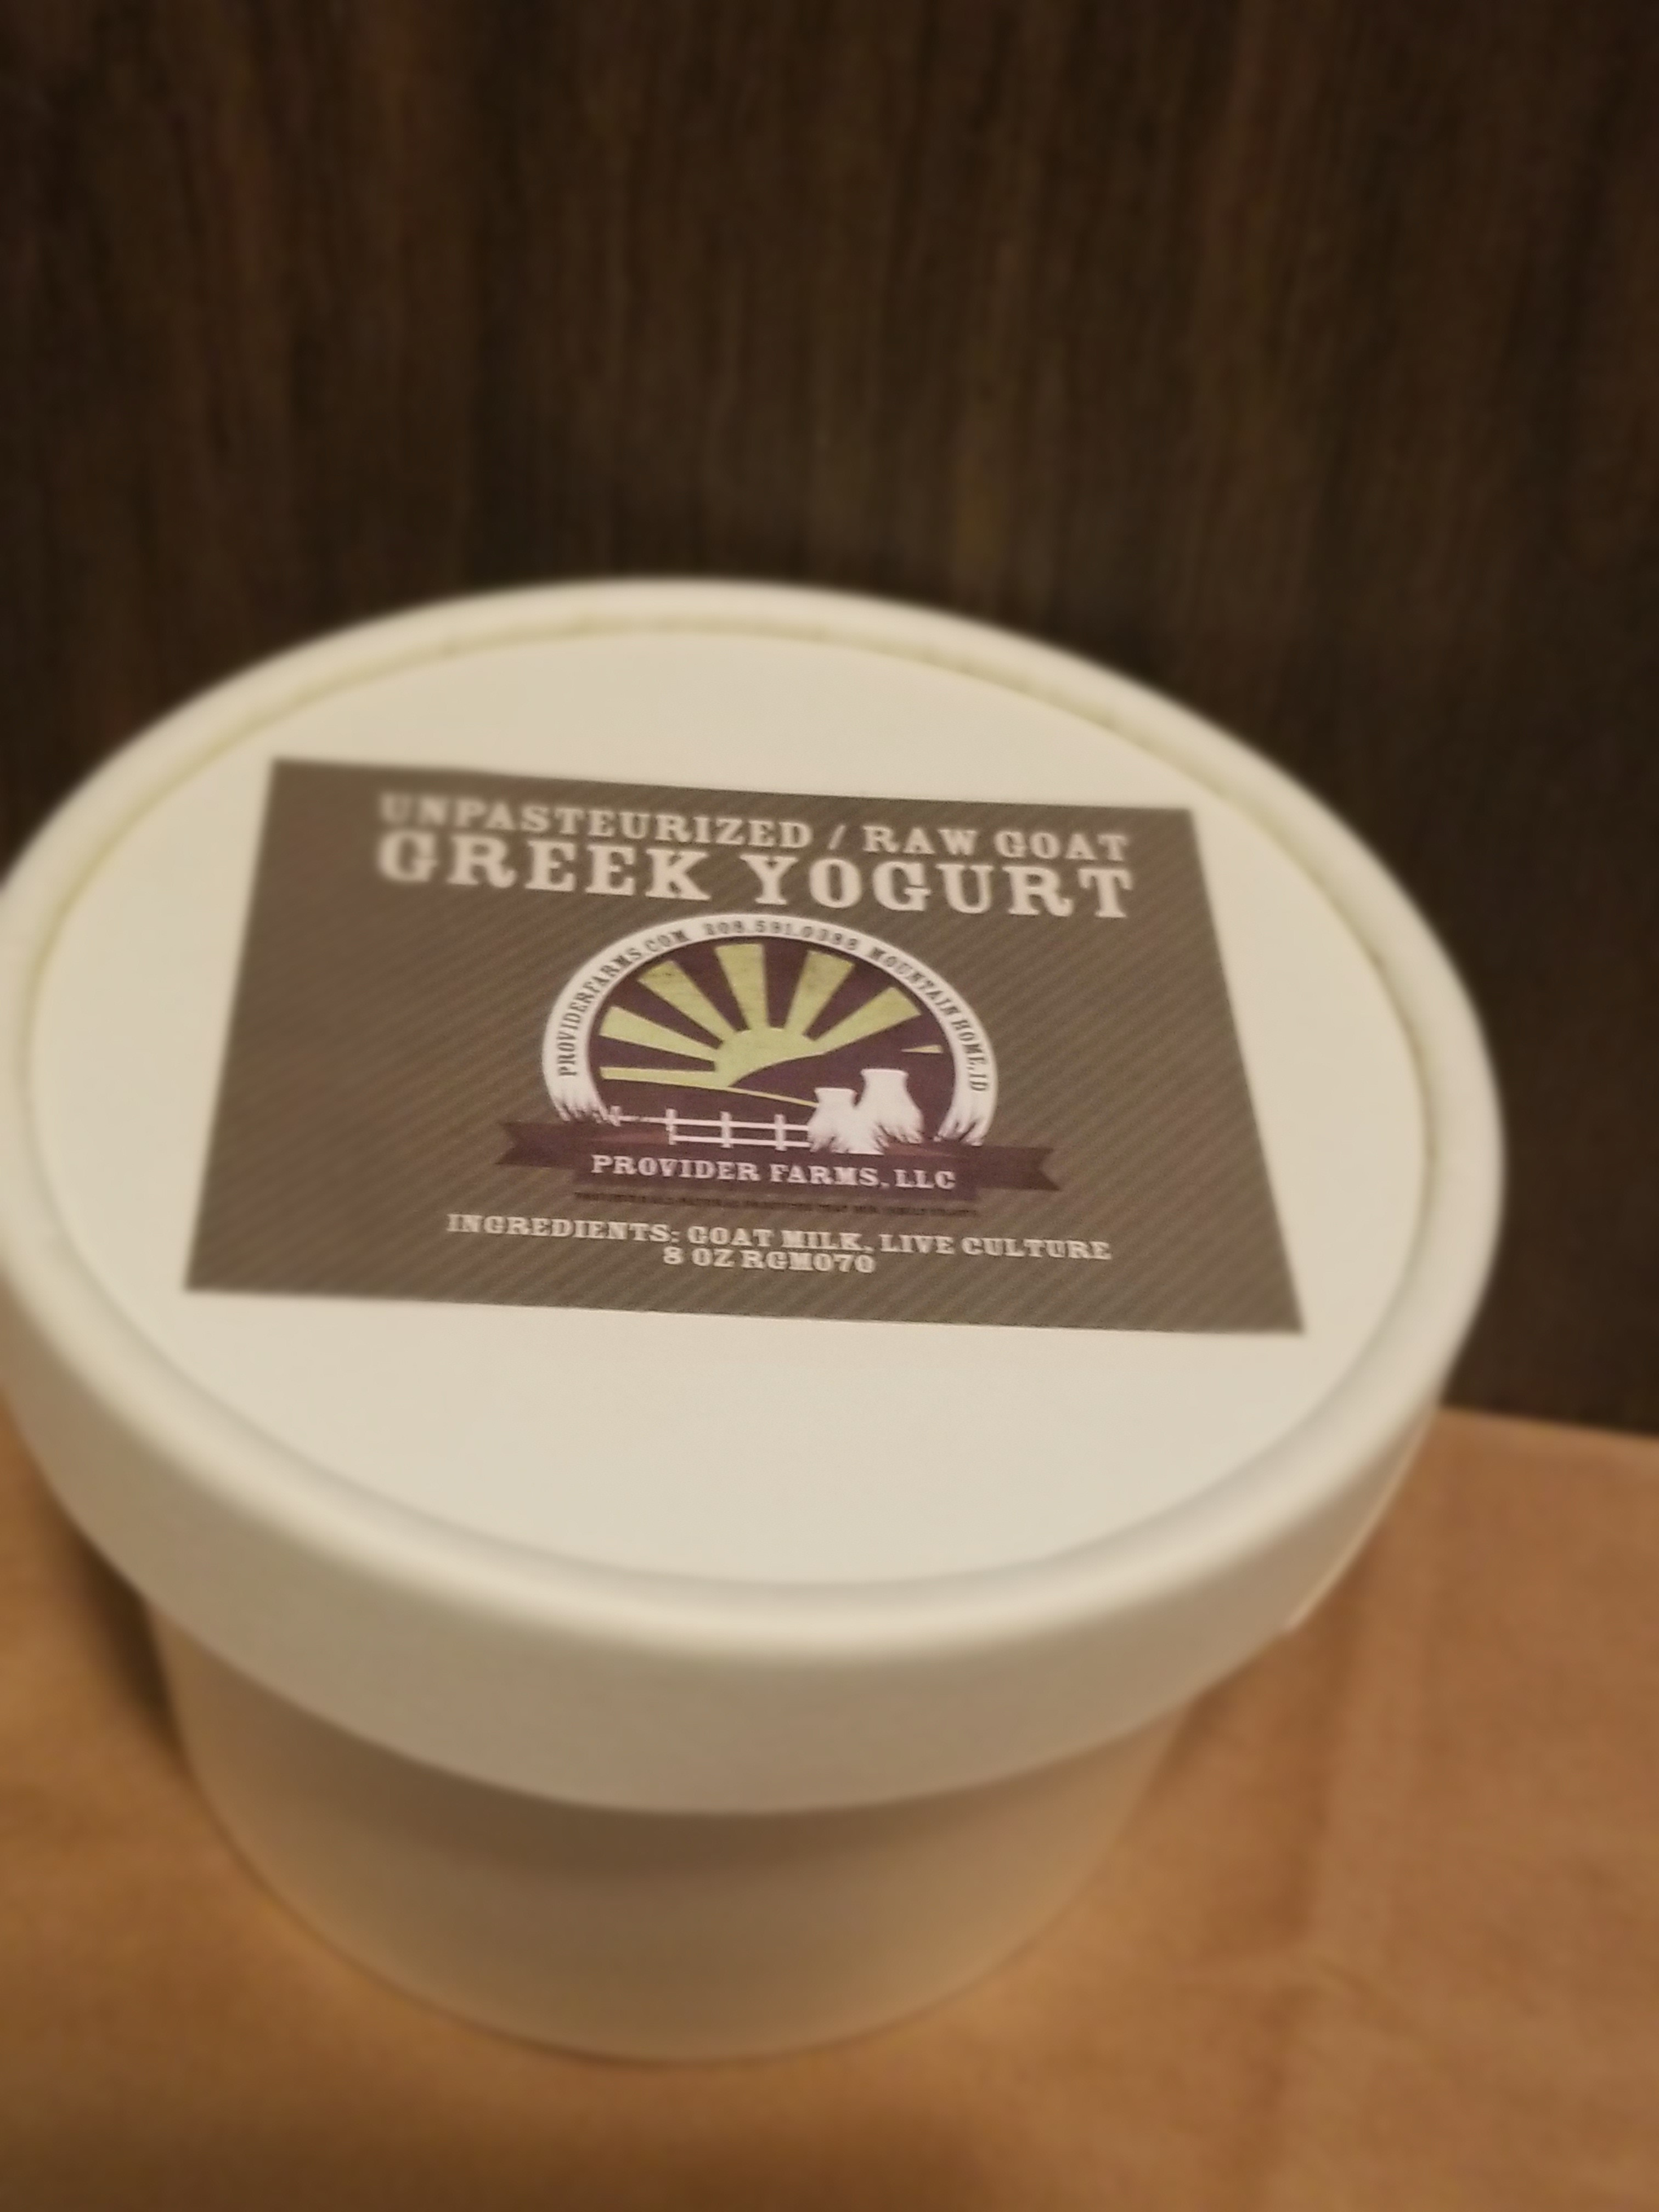 Goat Greek Yogurt